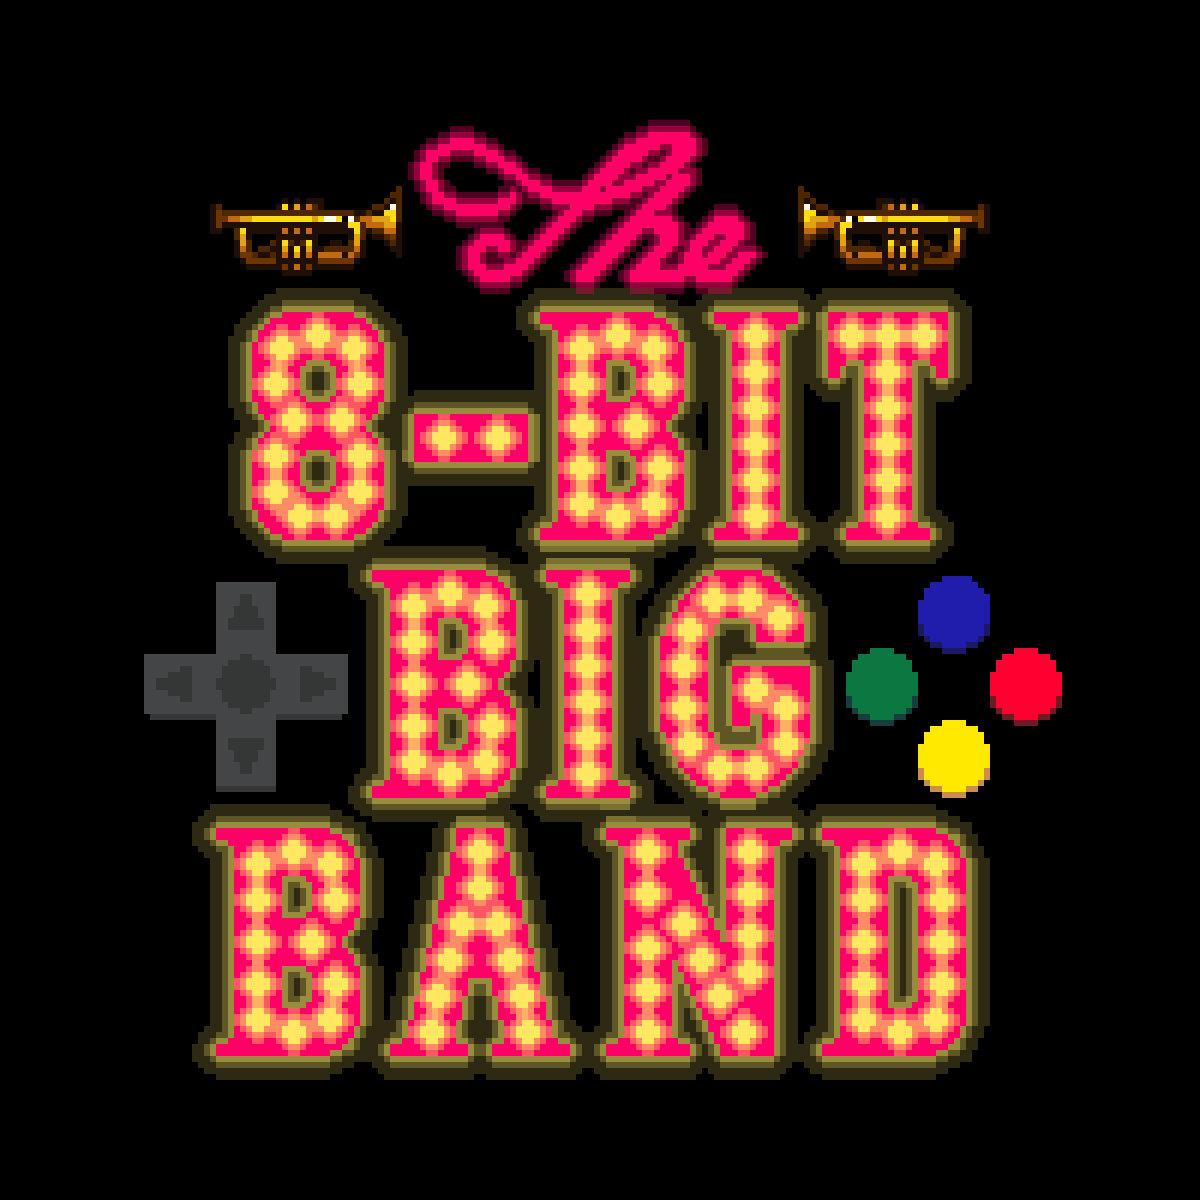 Overworld Theme (Super Mario Bro's 2) | The 8-Bit Big Band